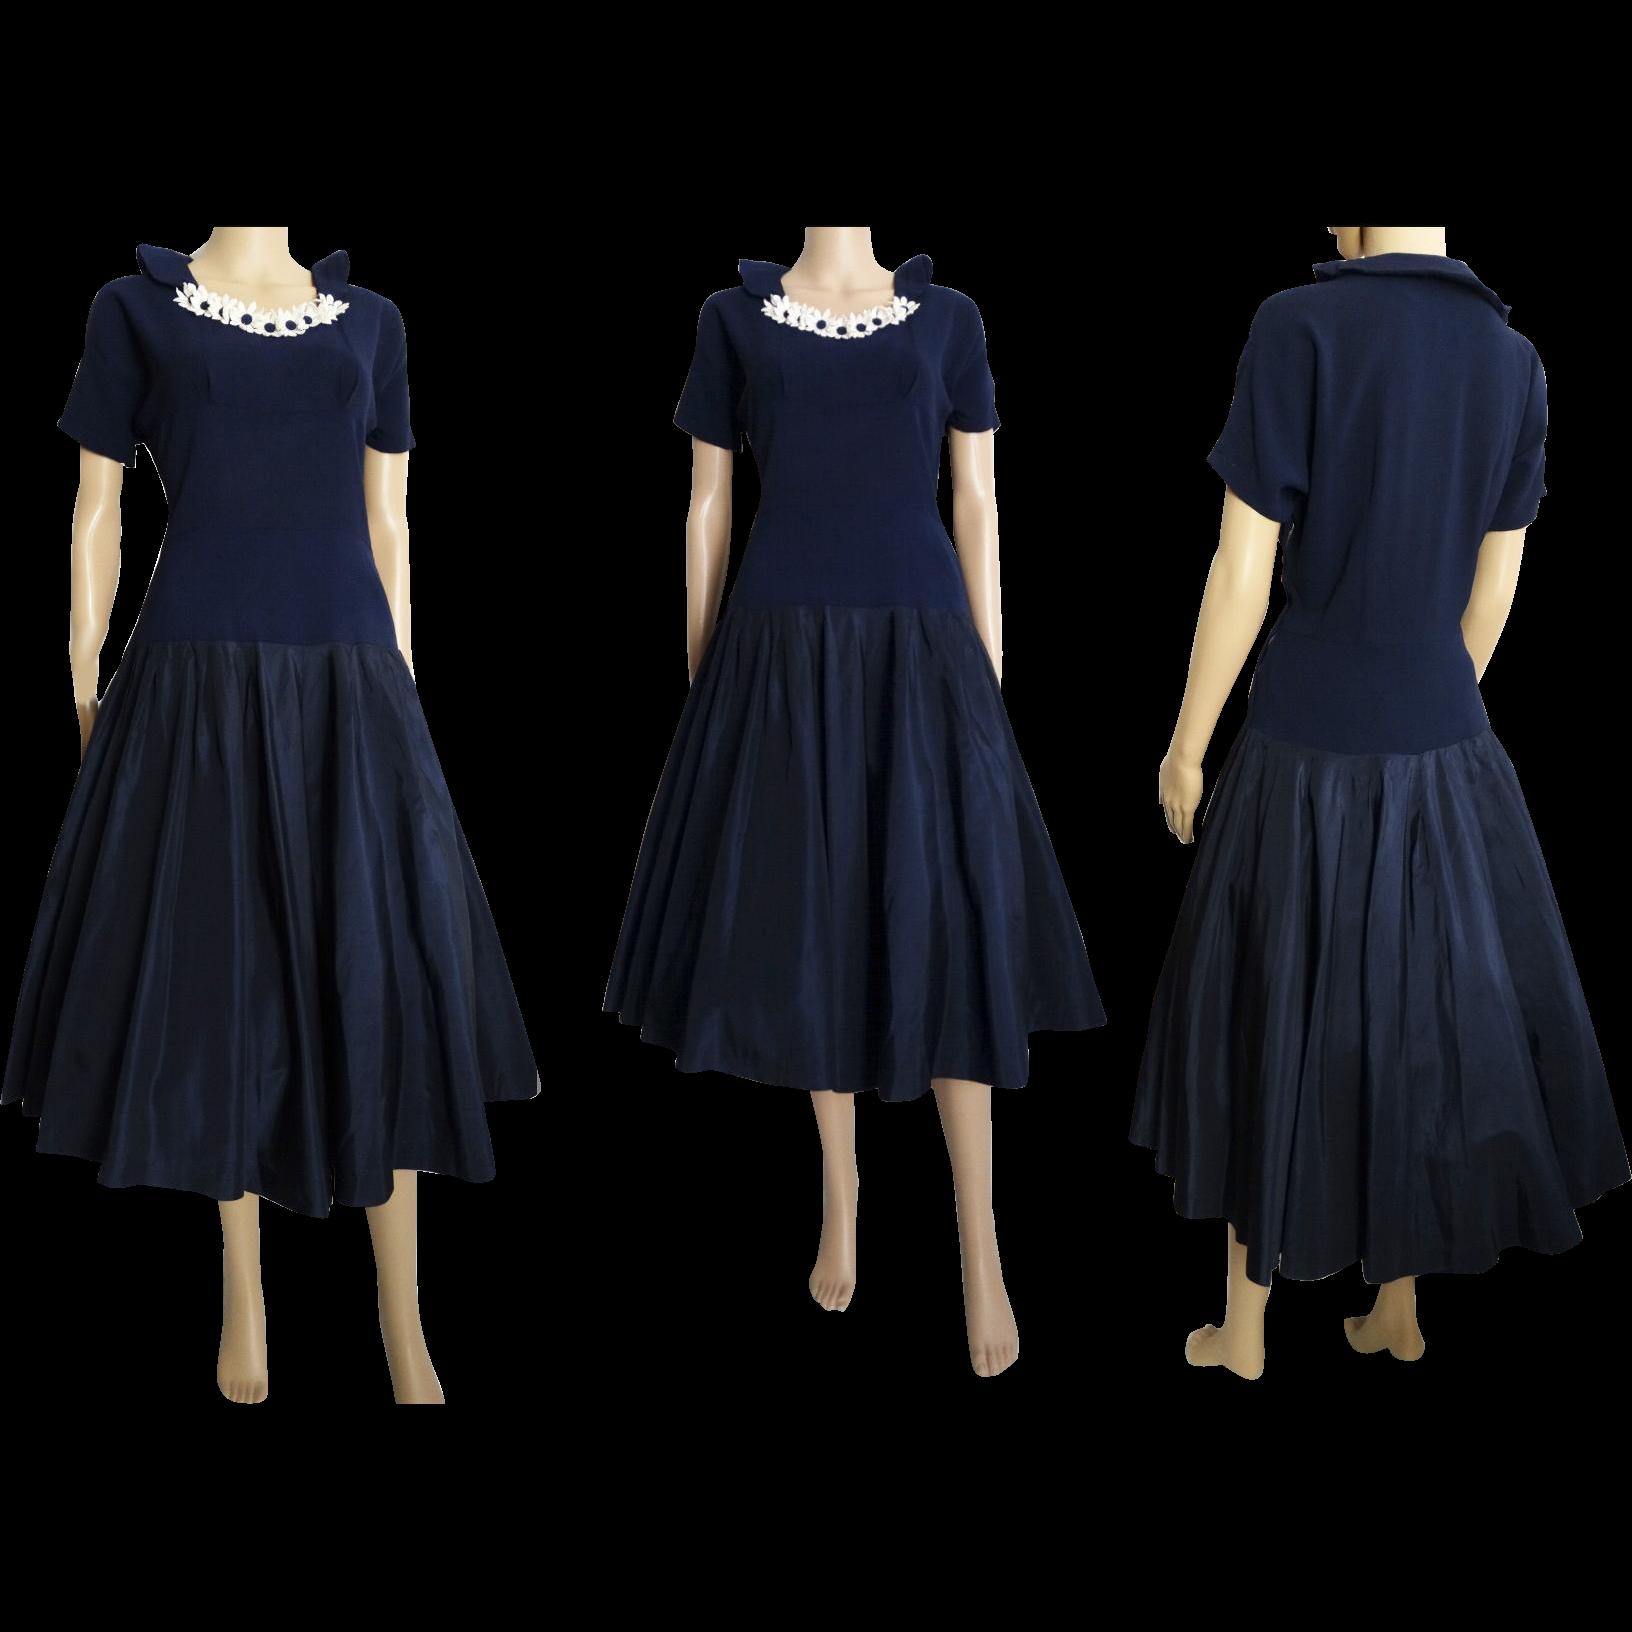 Vintage 1940s Dress . 40s Dress . Navy Blue - Party Dress . Daises ...